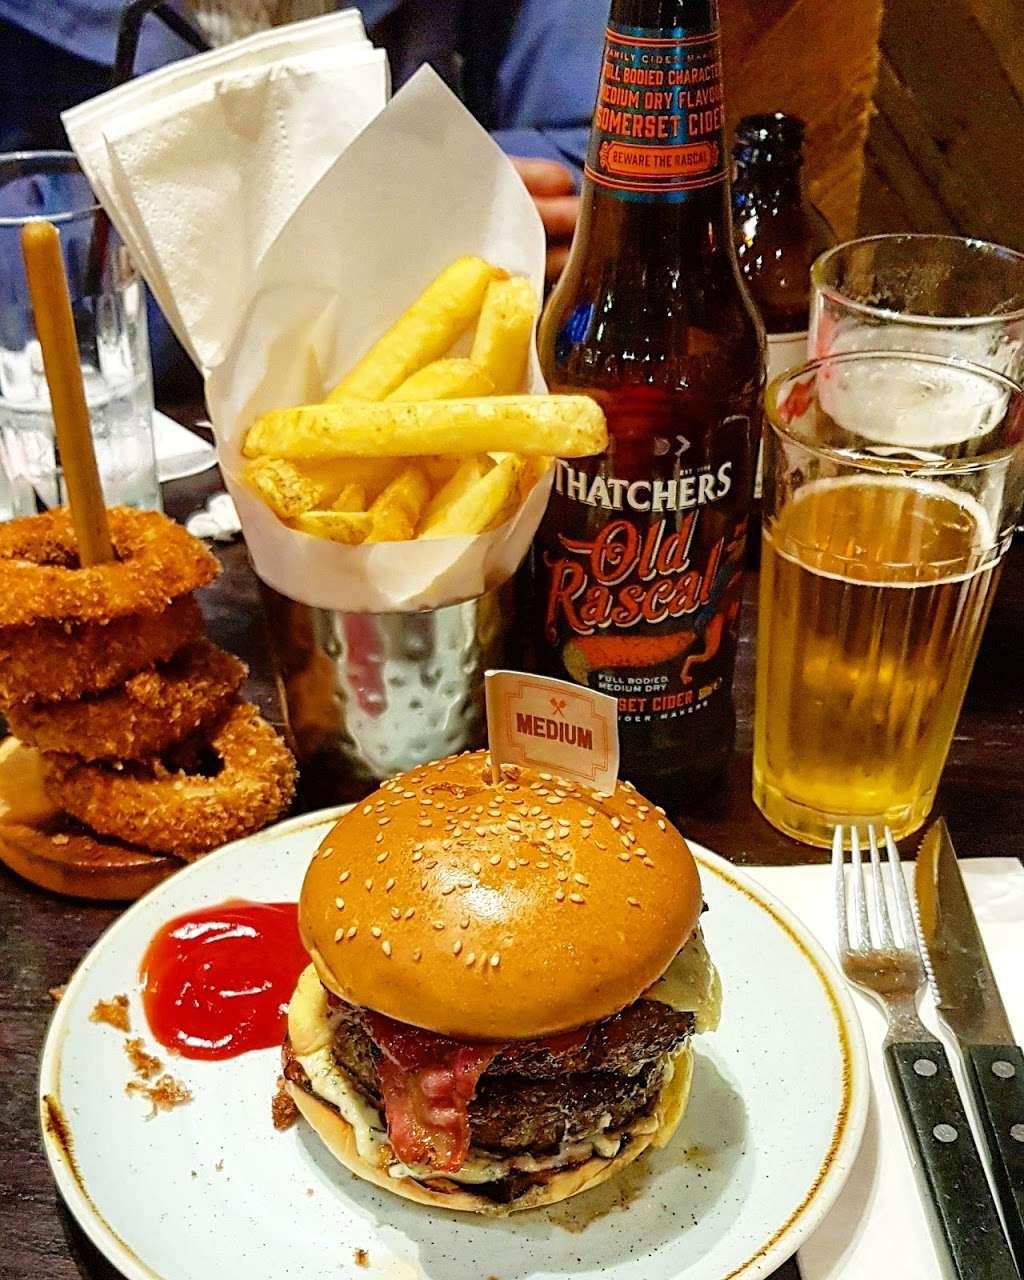 Gourmet Burger Kitchen (Baker Street) - restaurant  | Photo 7 of 10 | Address: 102 Baker St, Marylebone, London W1U 6TL, UK | Phone: 020 7486 8516